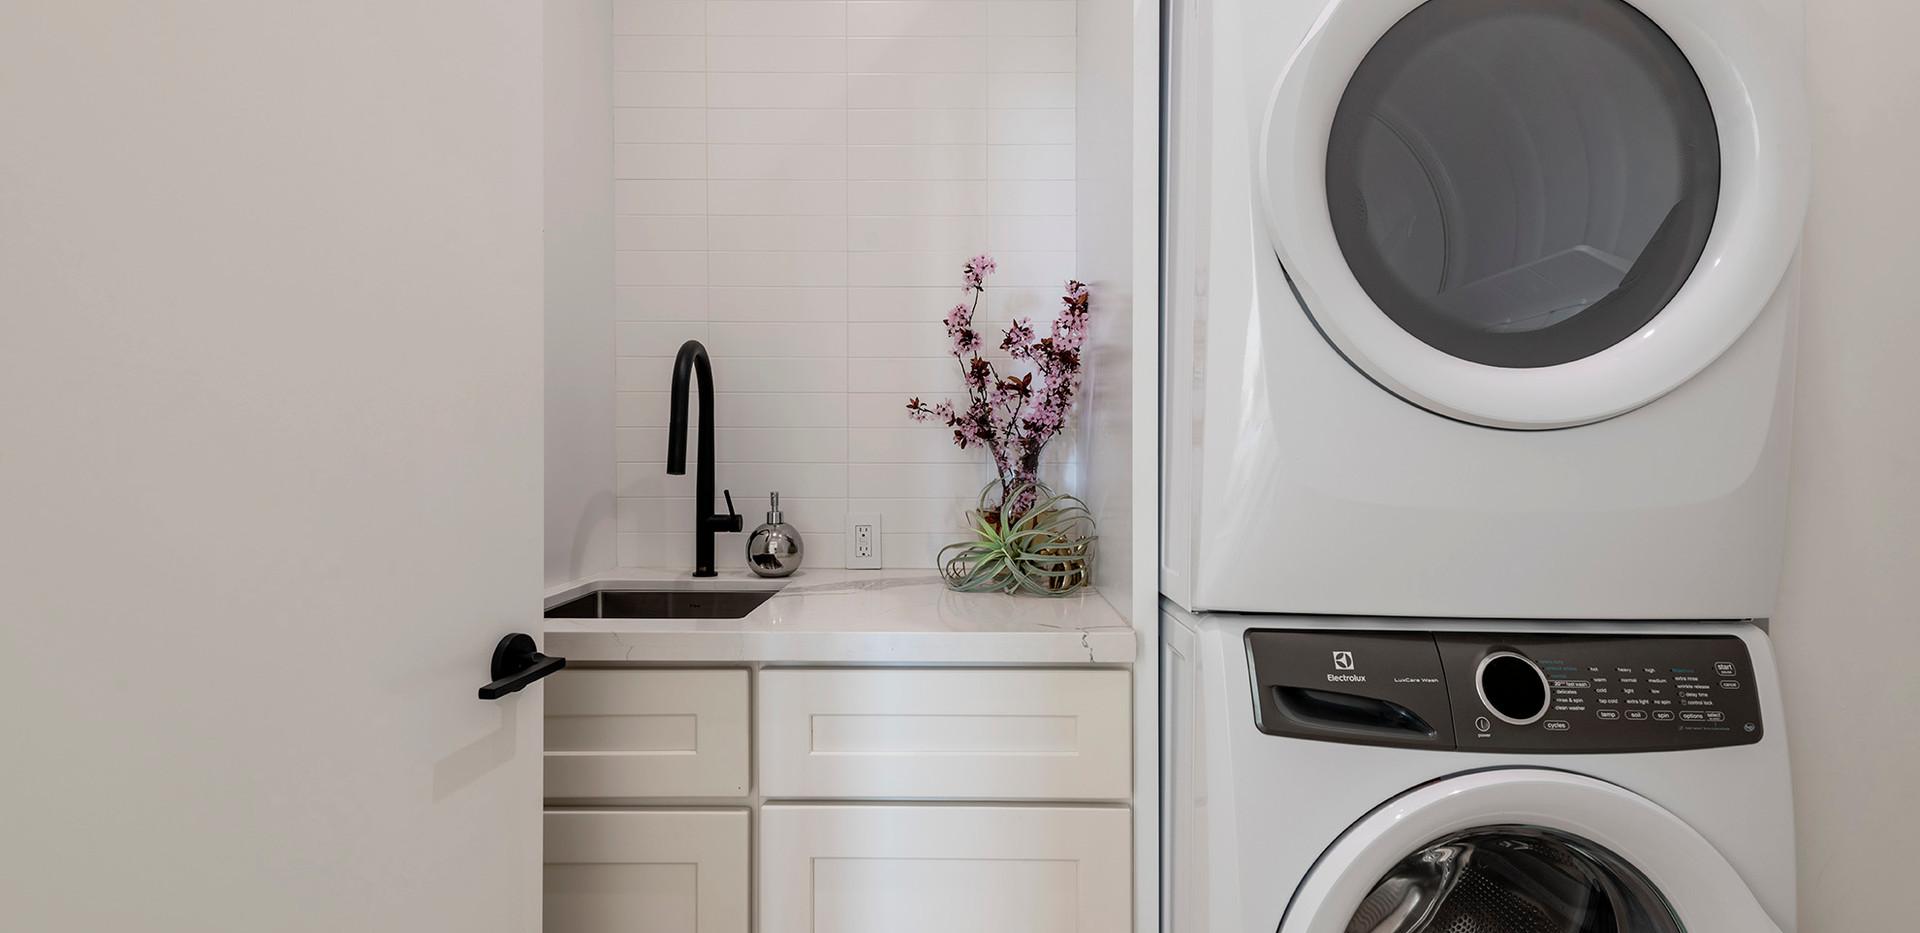 61_laundryroom.jpg